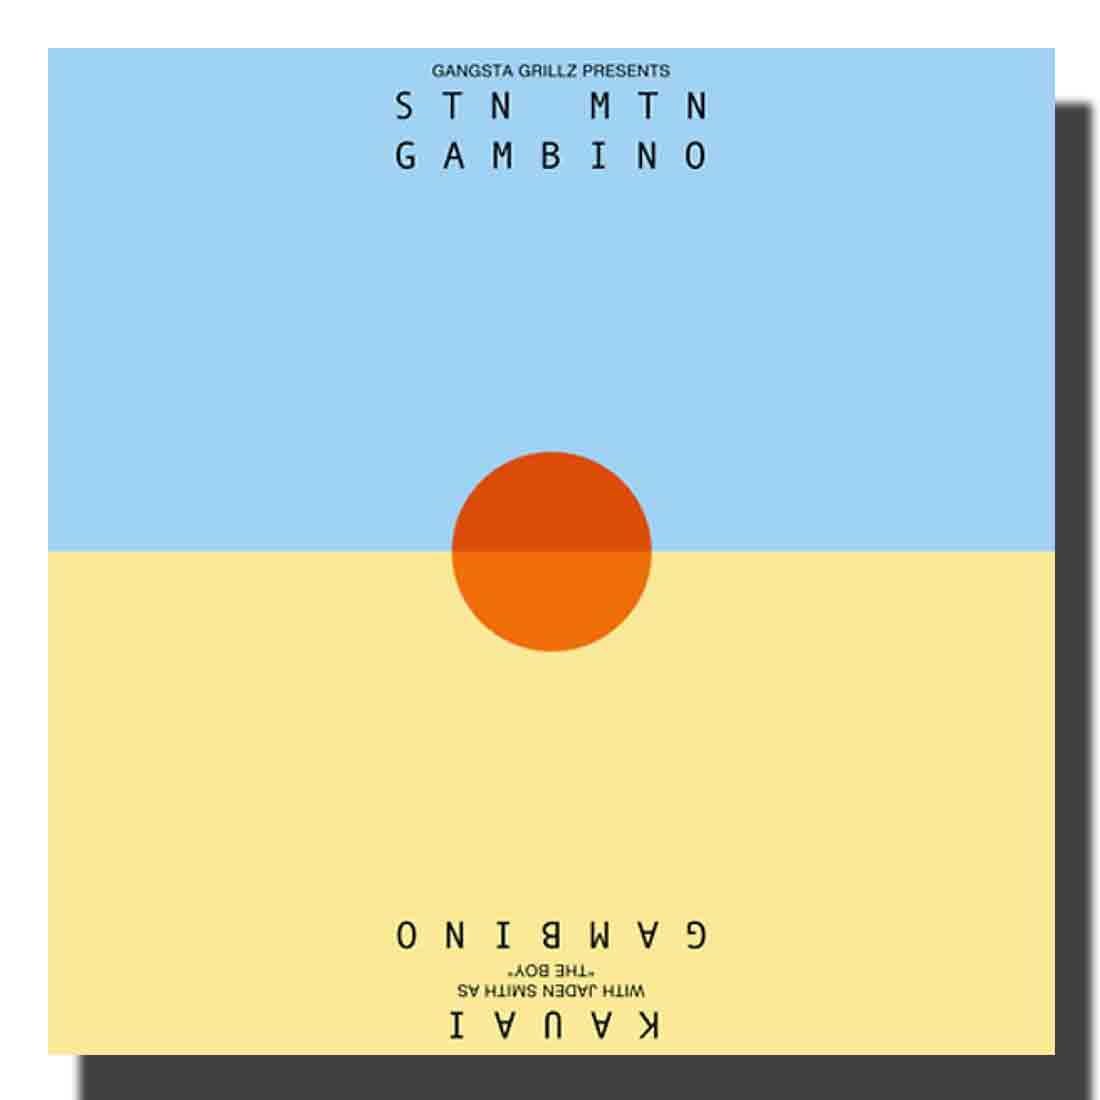 Childish Gambino STN MTN Kauai 2014 Rap Album Silk Cloth Poster D-820